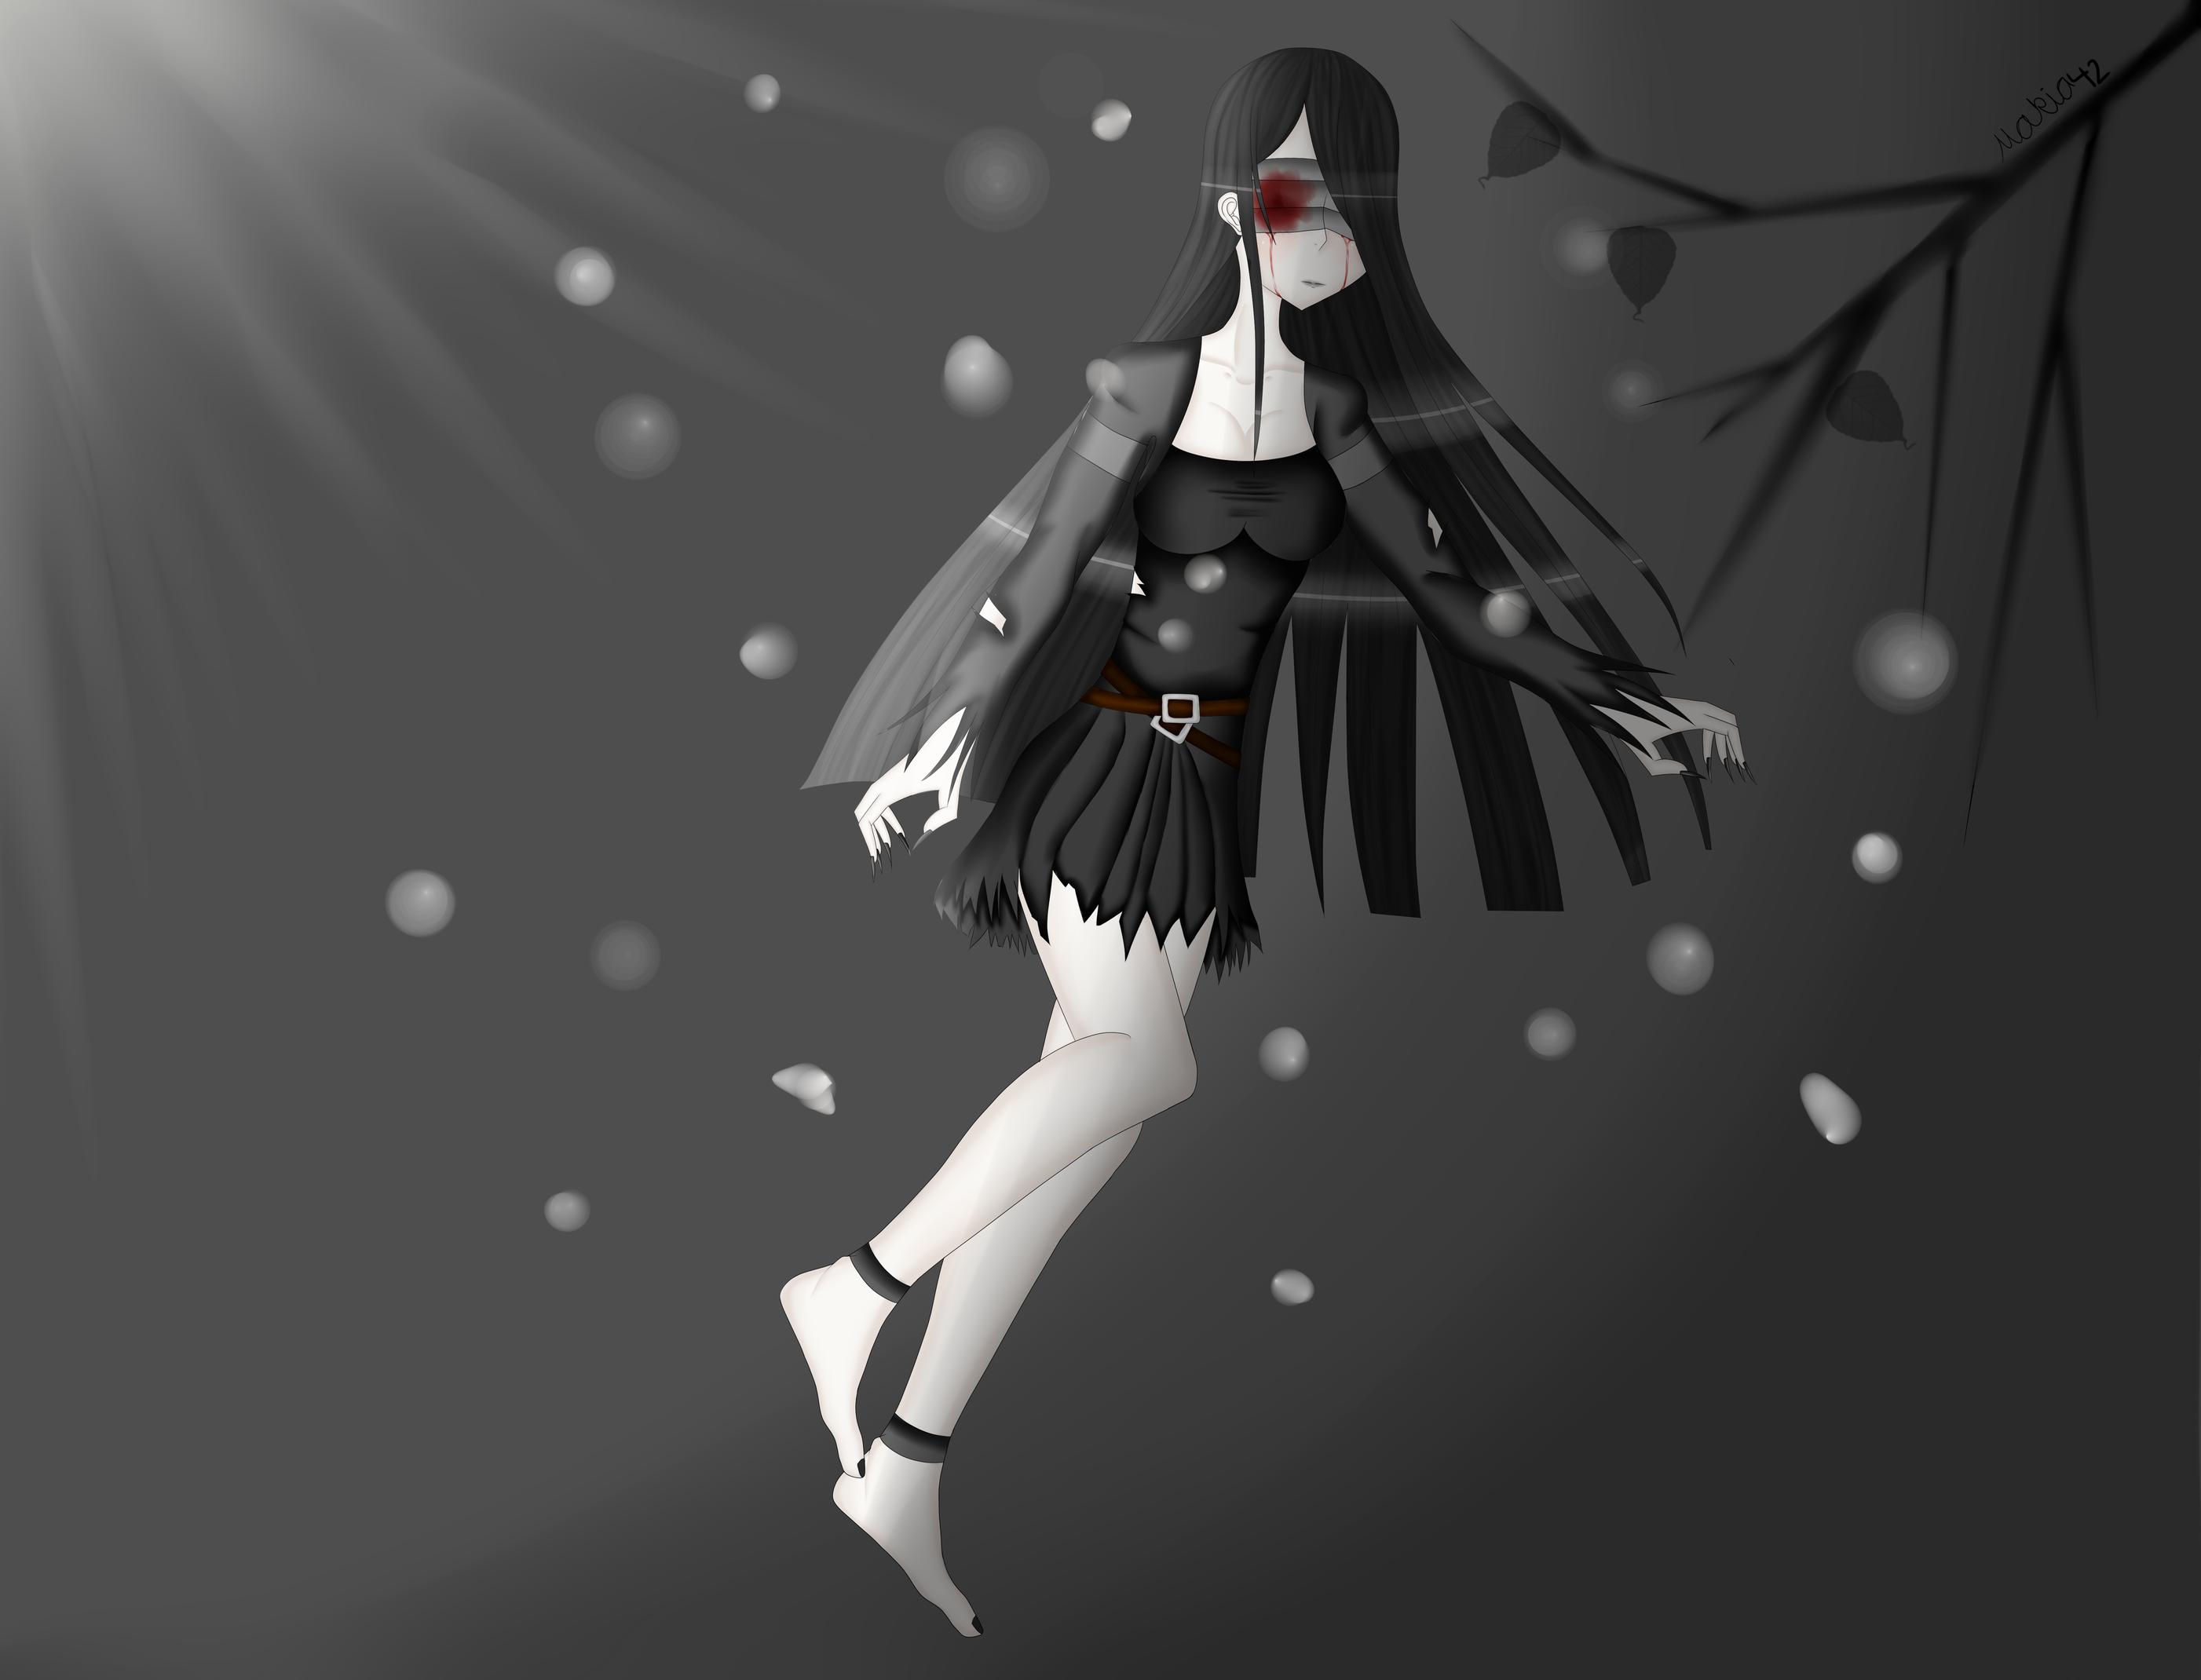 Darkness by Makia42